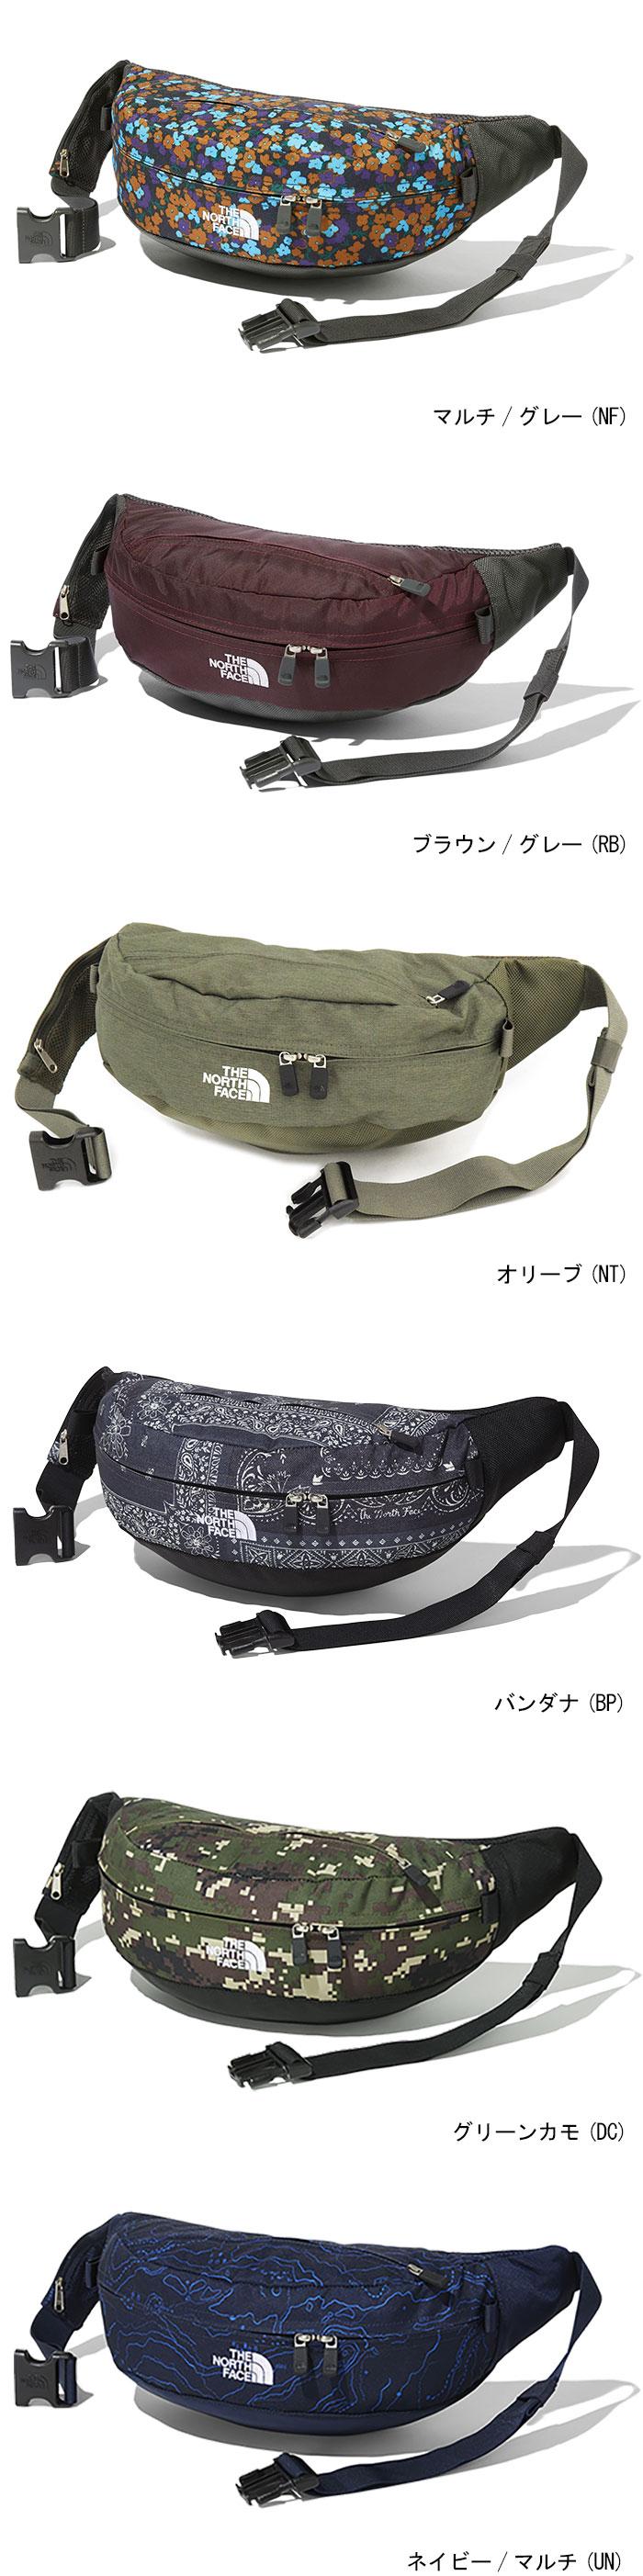 THE NORTH FACEザ ノースフェイスのバッグ Sweep Waist Bag06